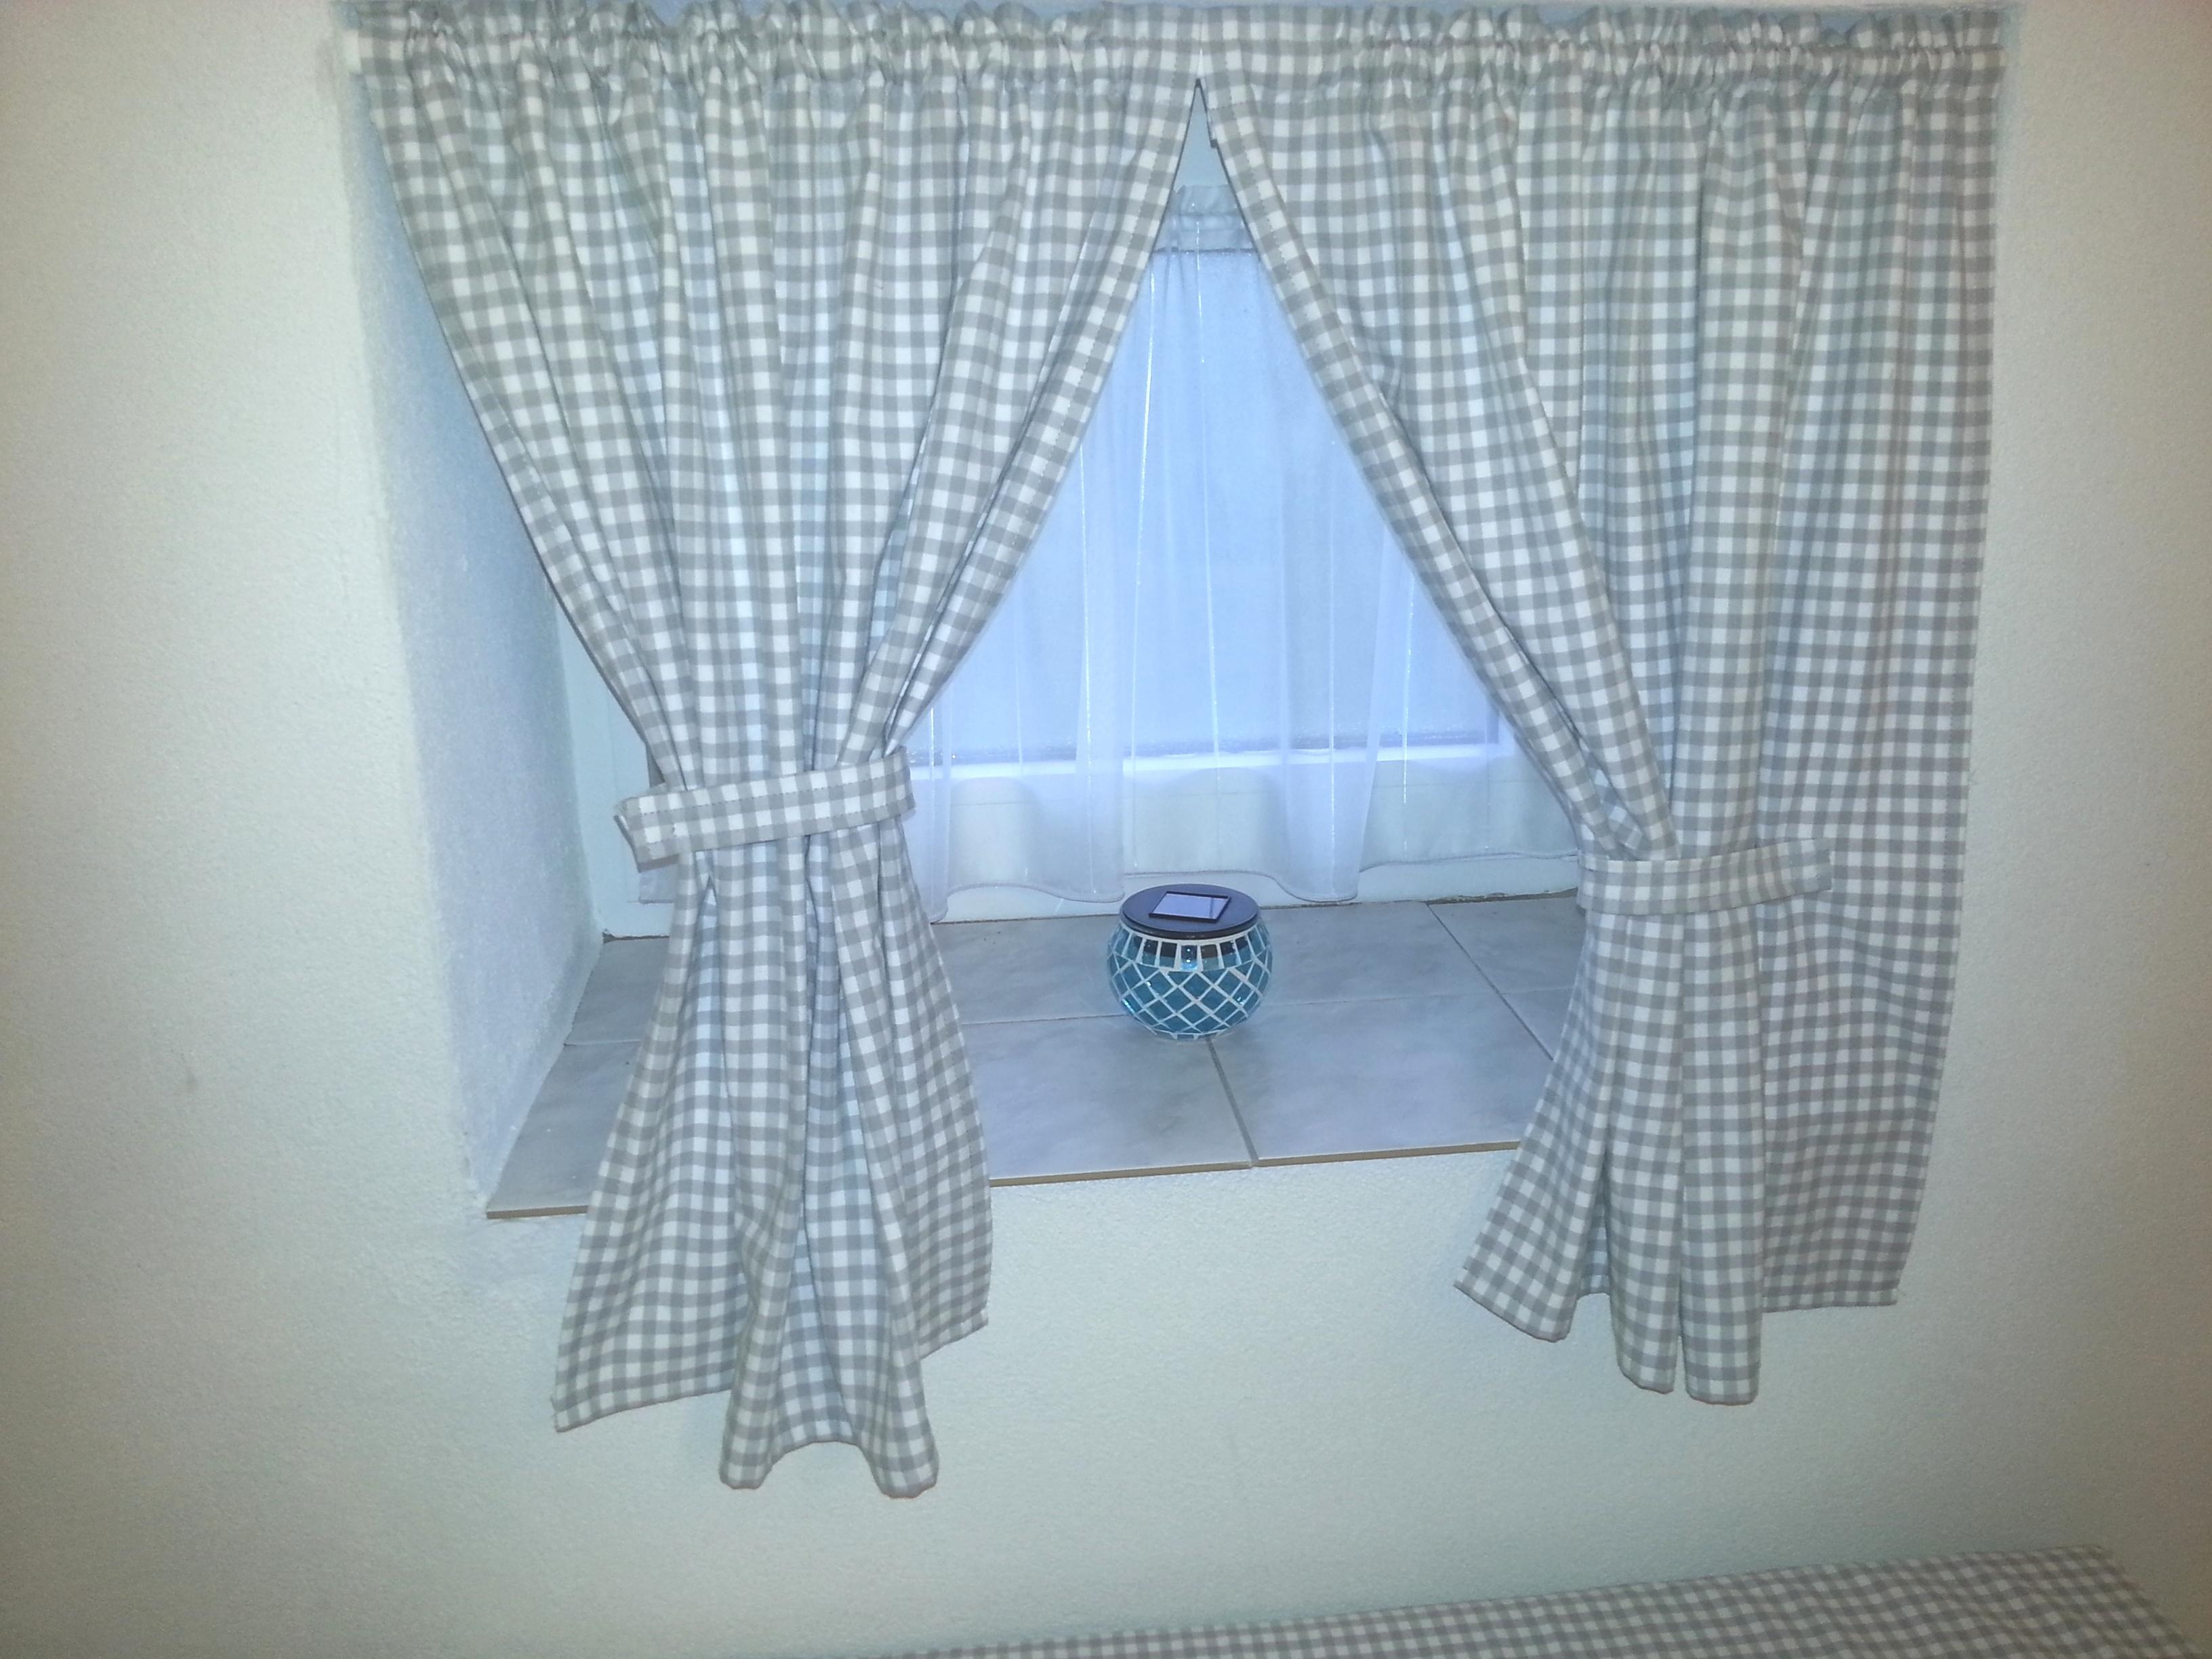 gardinenvorh nge raffen ohne zu bohren oder zu kleben magnet blog. Black Bedroom Furniture Sets. Home Design Ideas